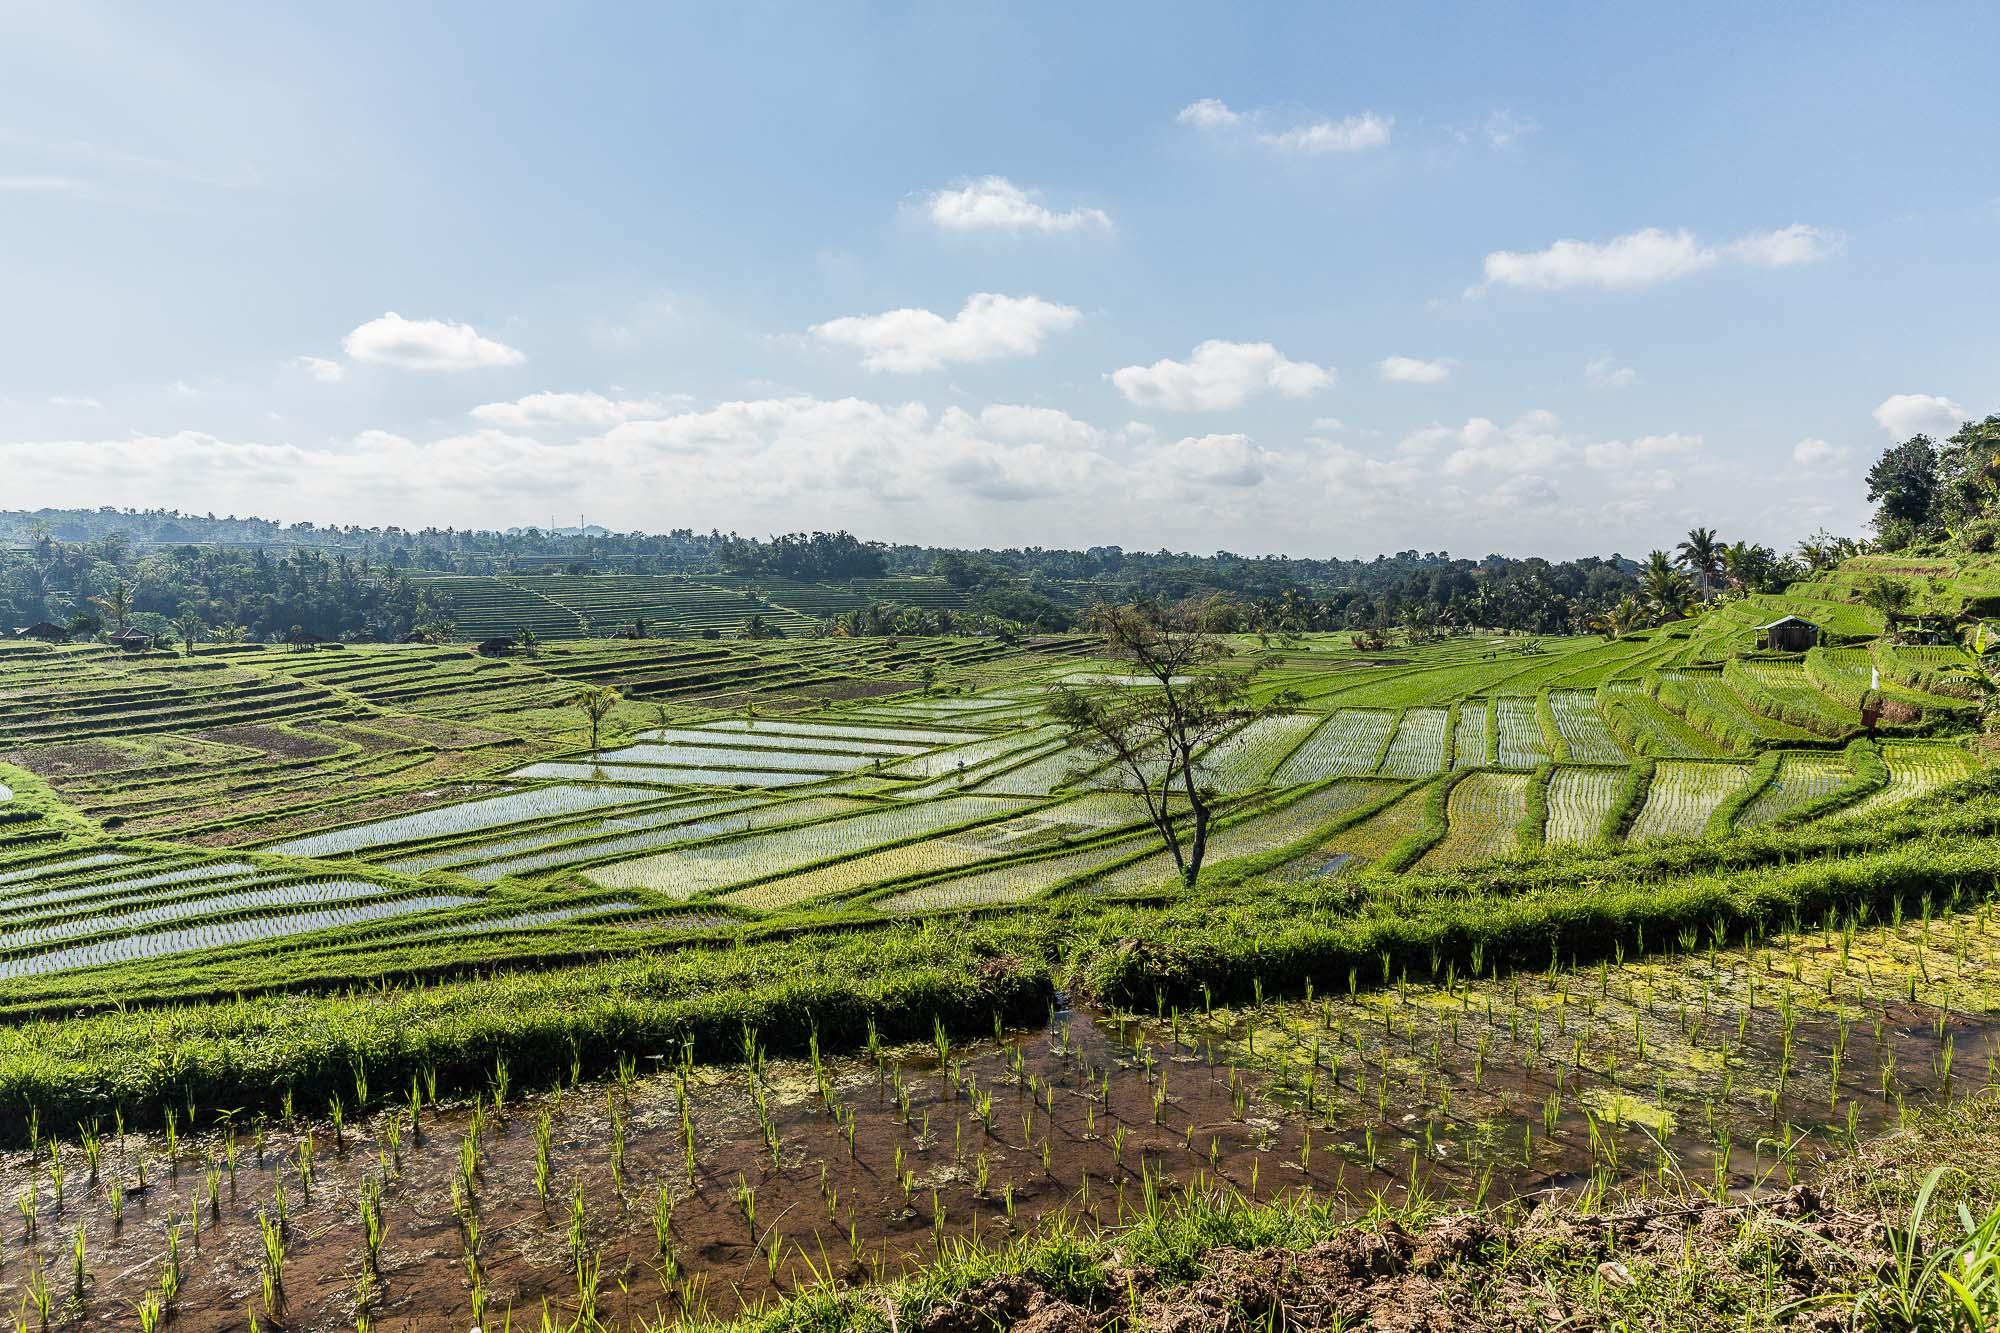 INDONESIA_2015_04 BALI_JusMedic_1094